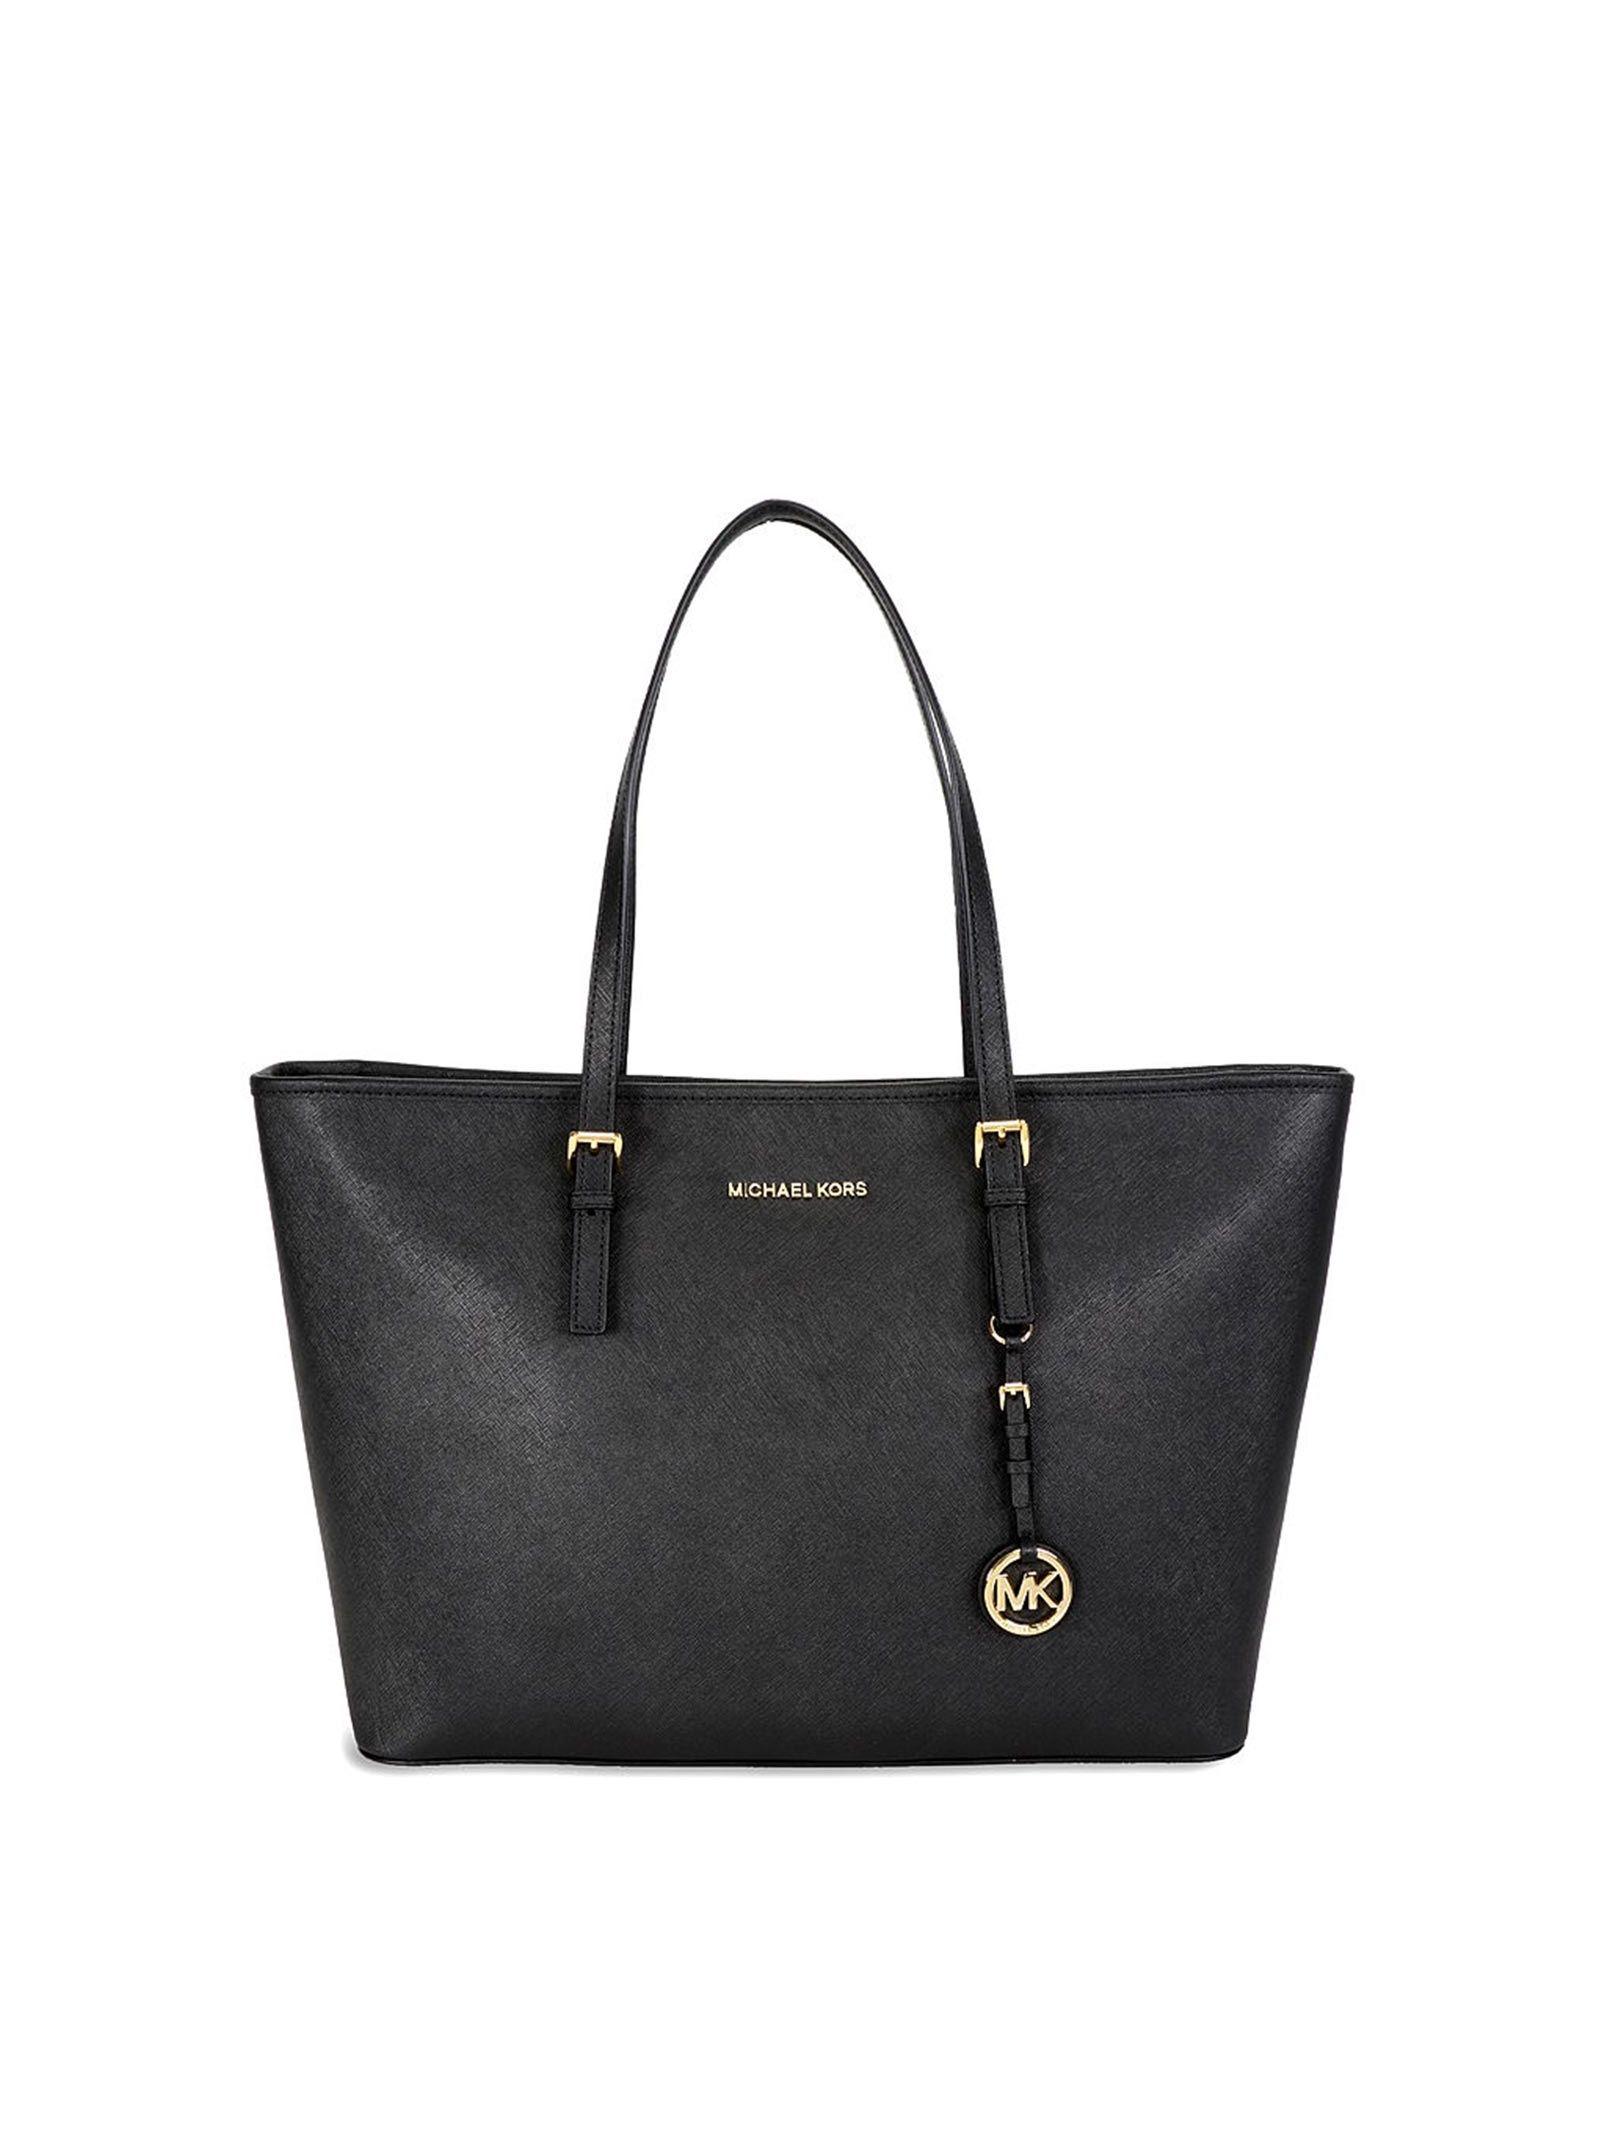 michael kors female michael kors jet set travel black bag